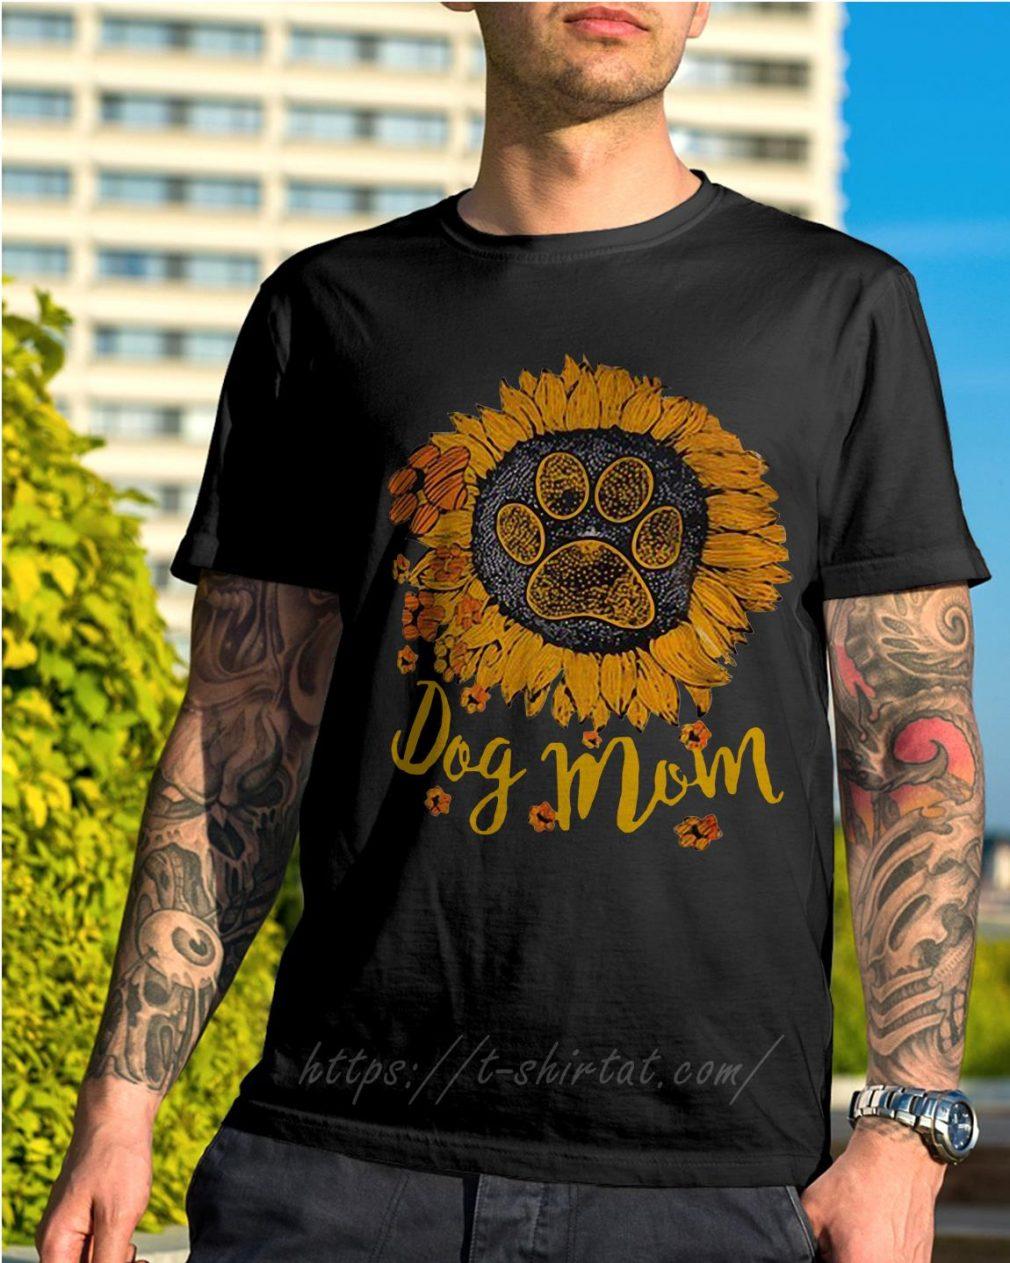 Dog paw sunflower dog mom shirt